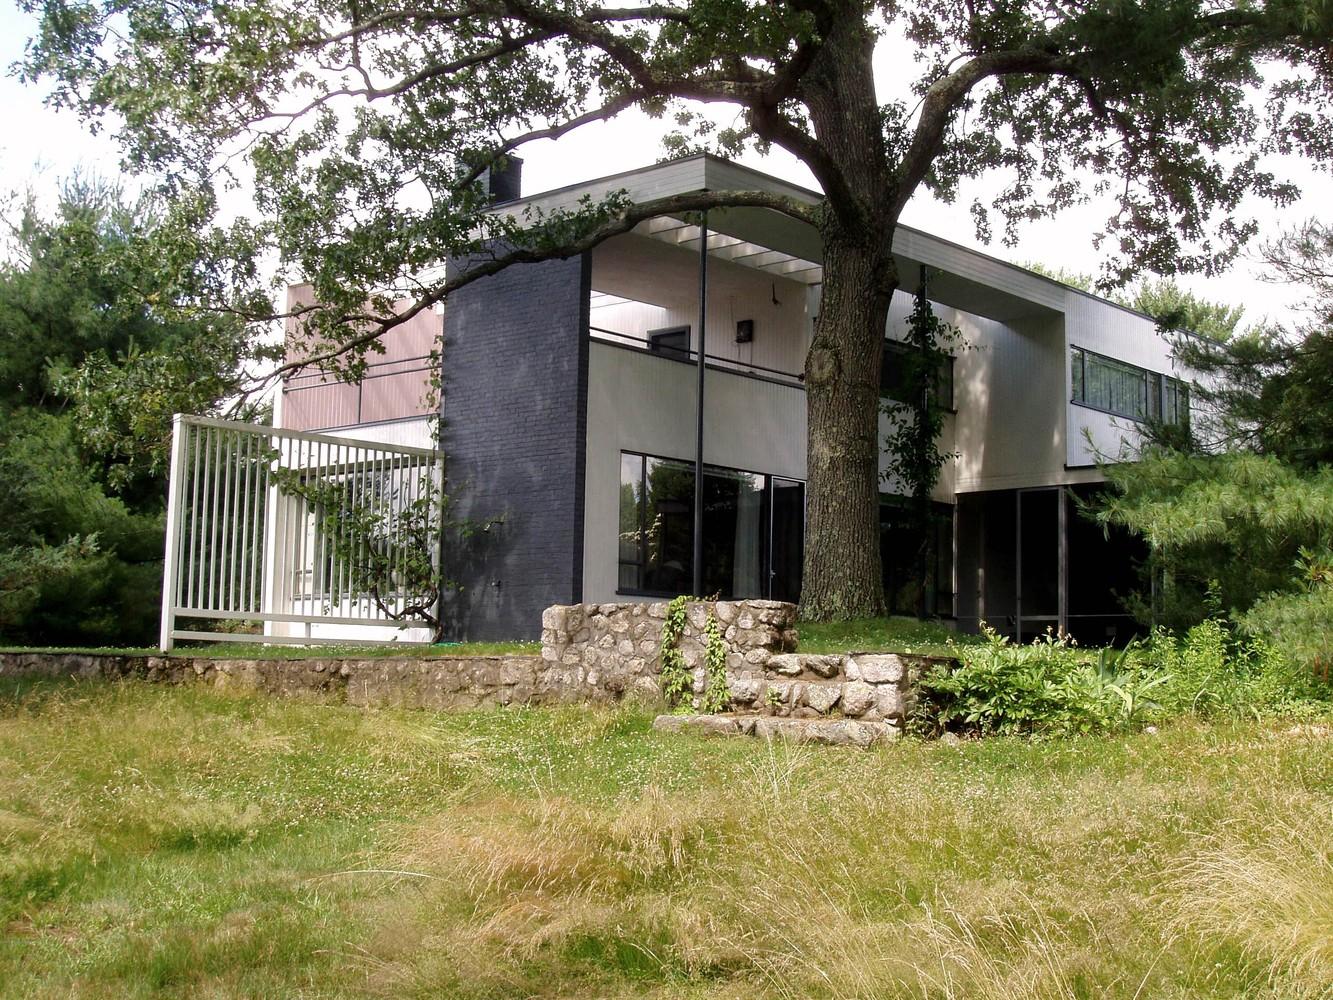 Gropius House gallery of ad classics ad classics gropius house walter gropius 7